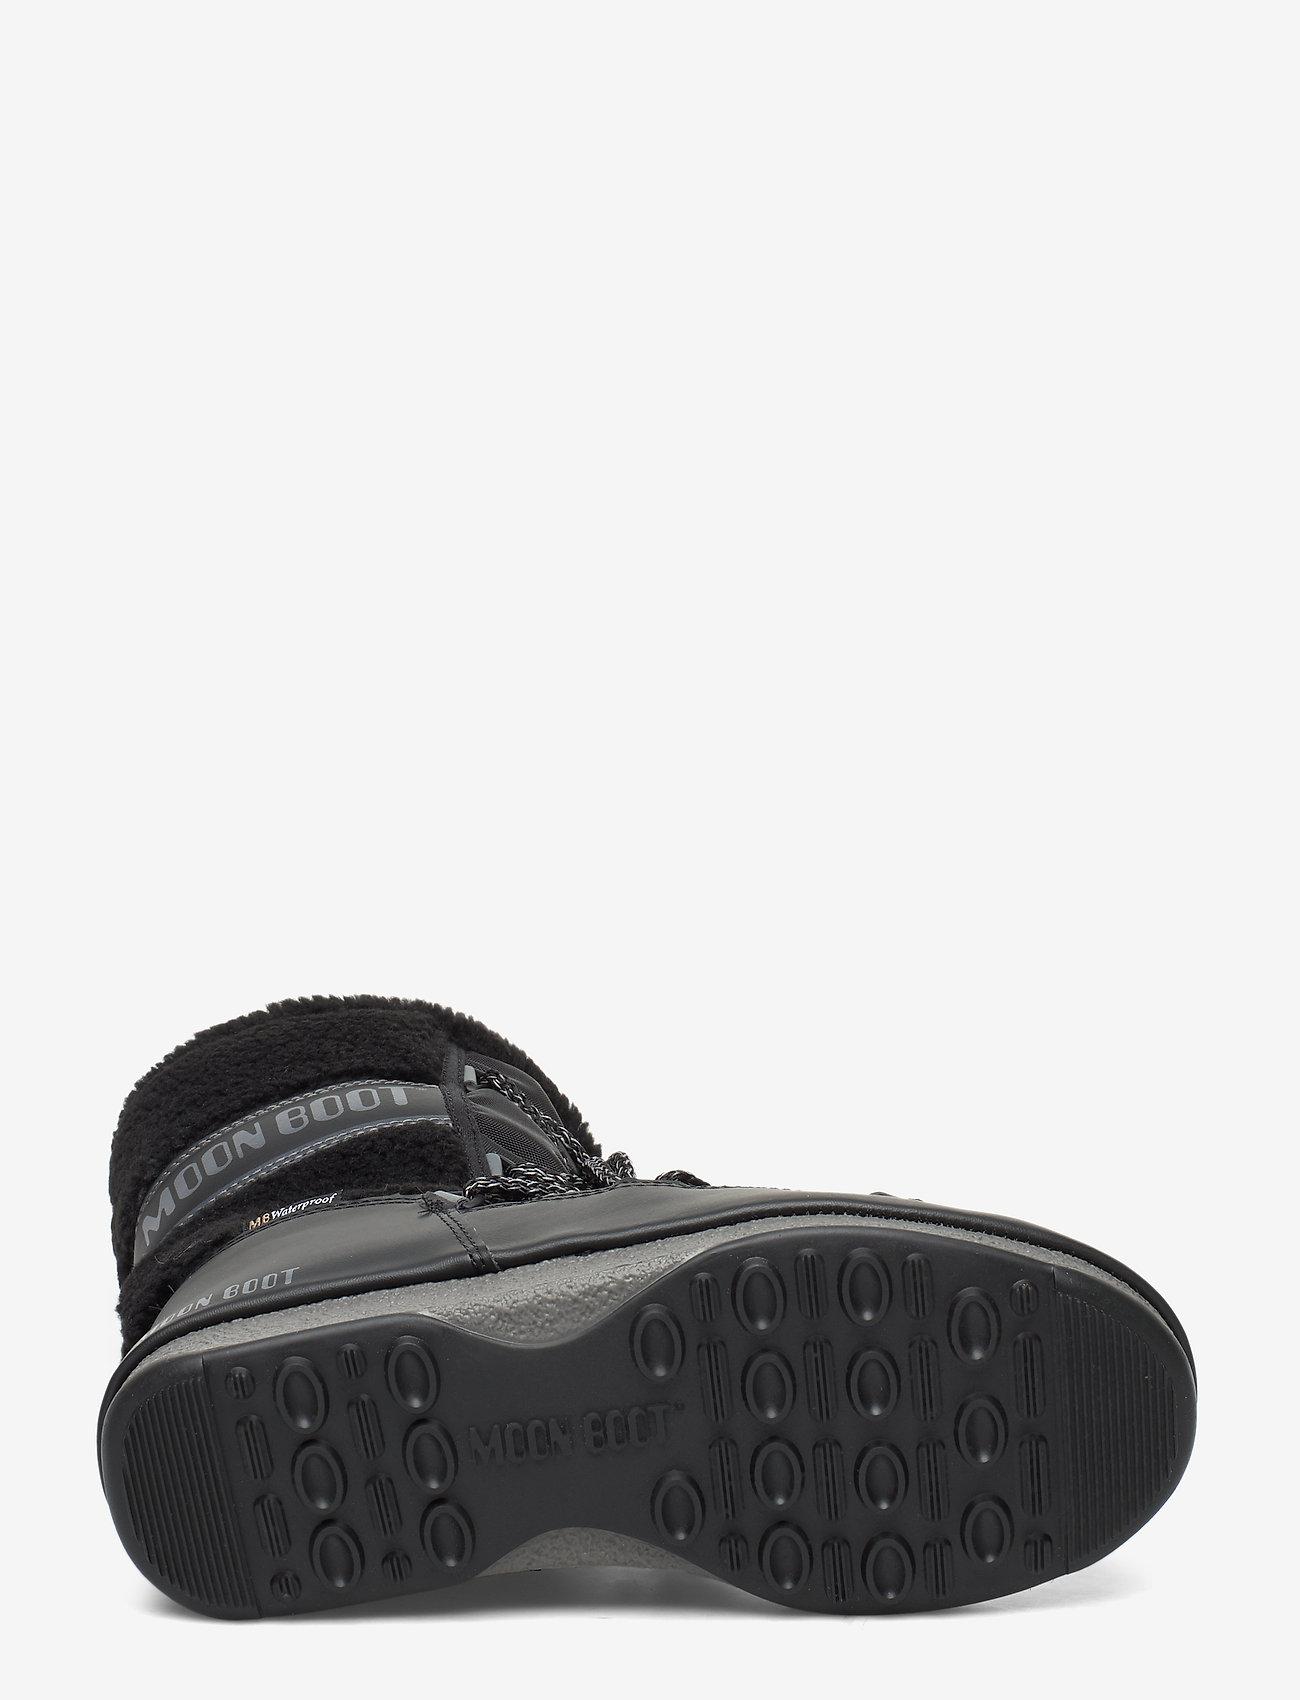 Mb Monaco Wool Mid Wp (Black) - Moon Boot